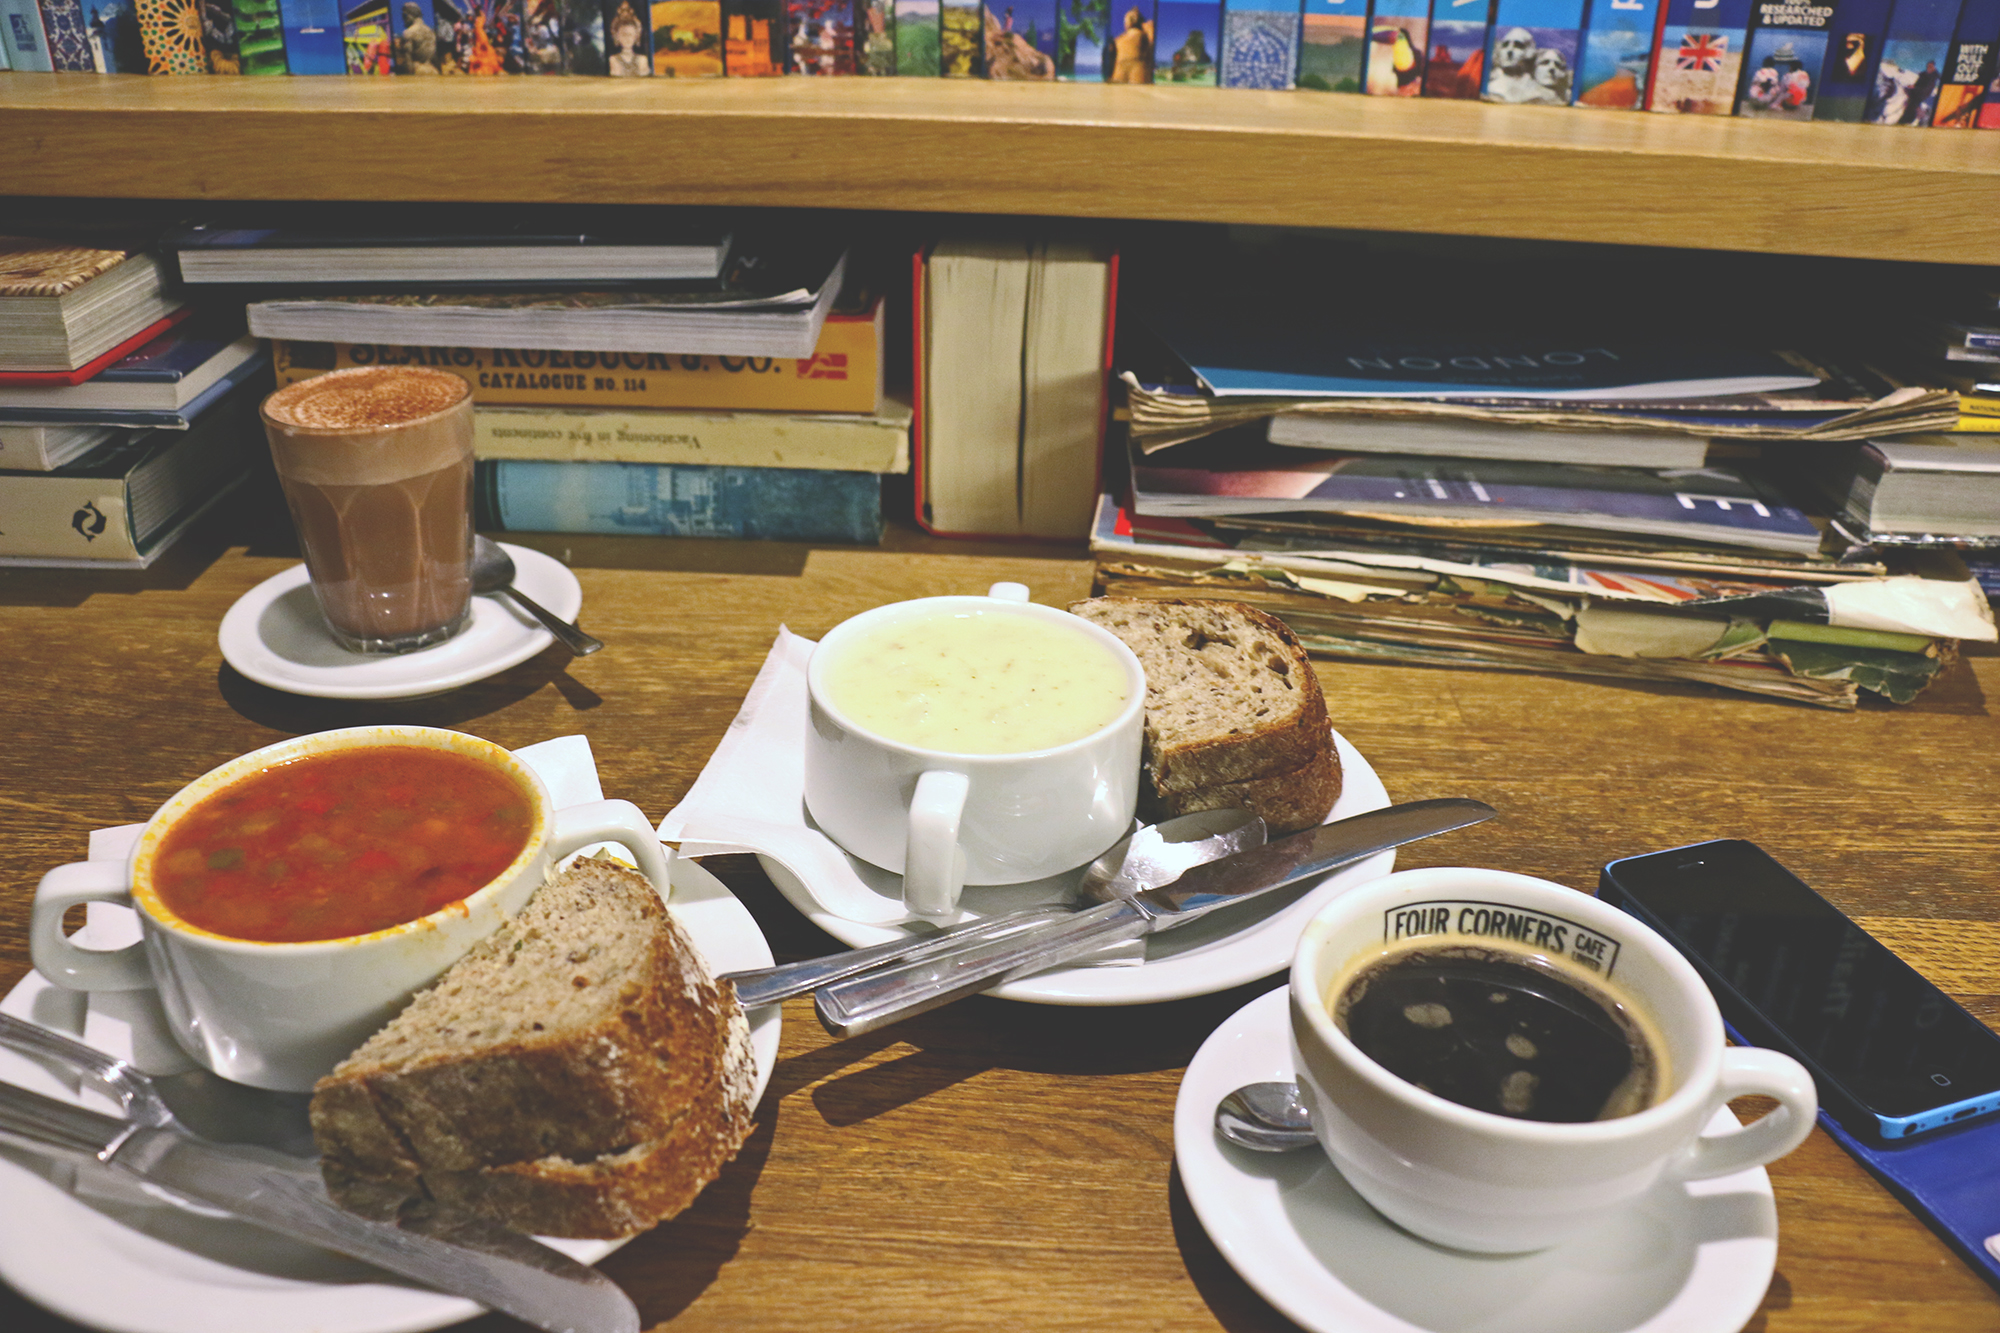 Four Corners London Cafe